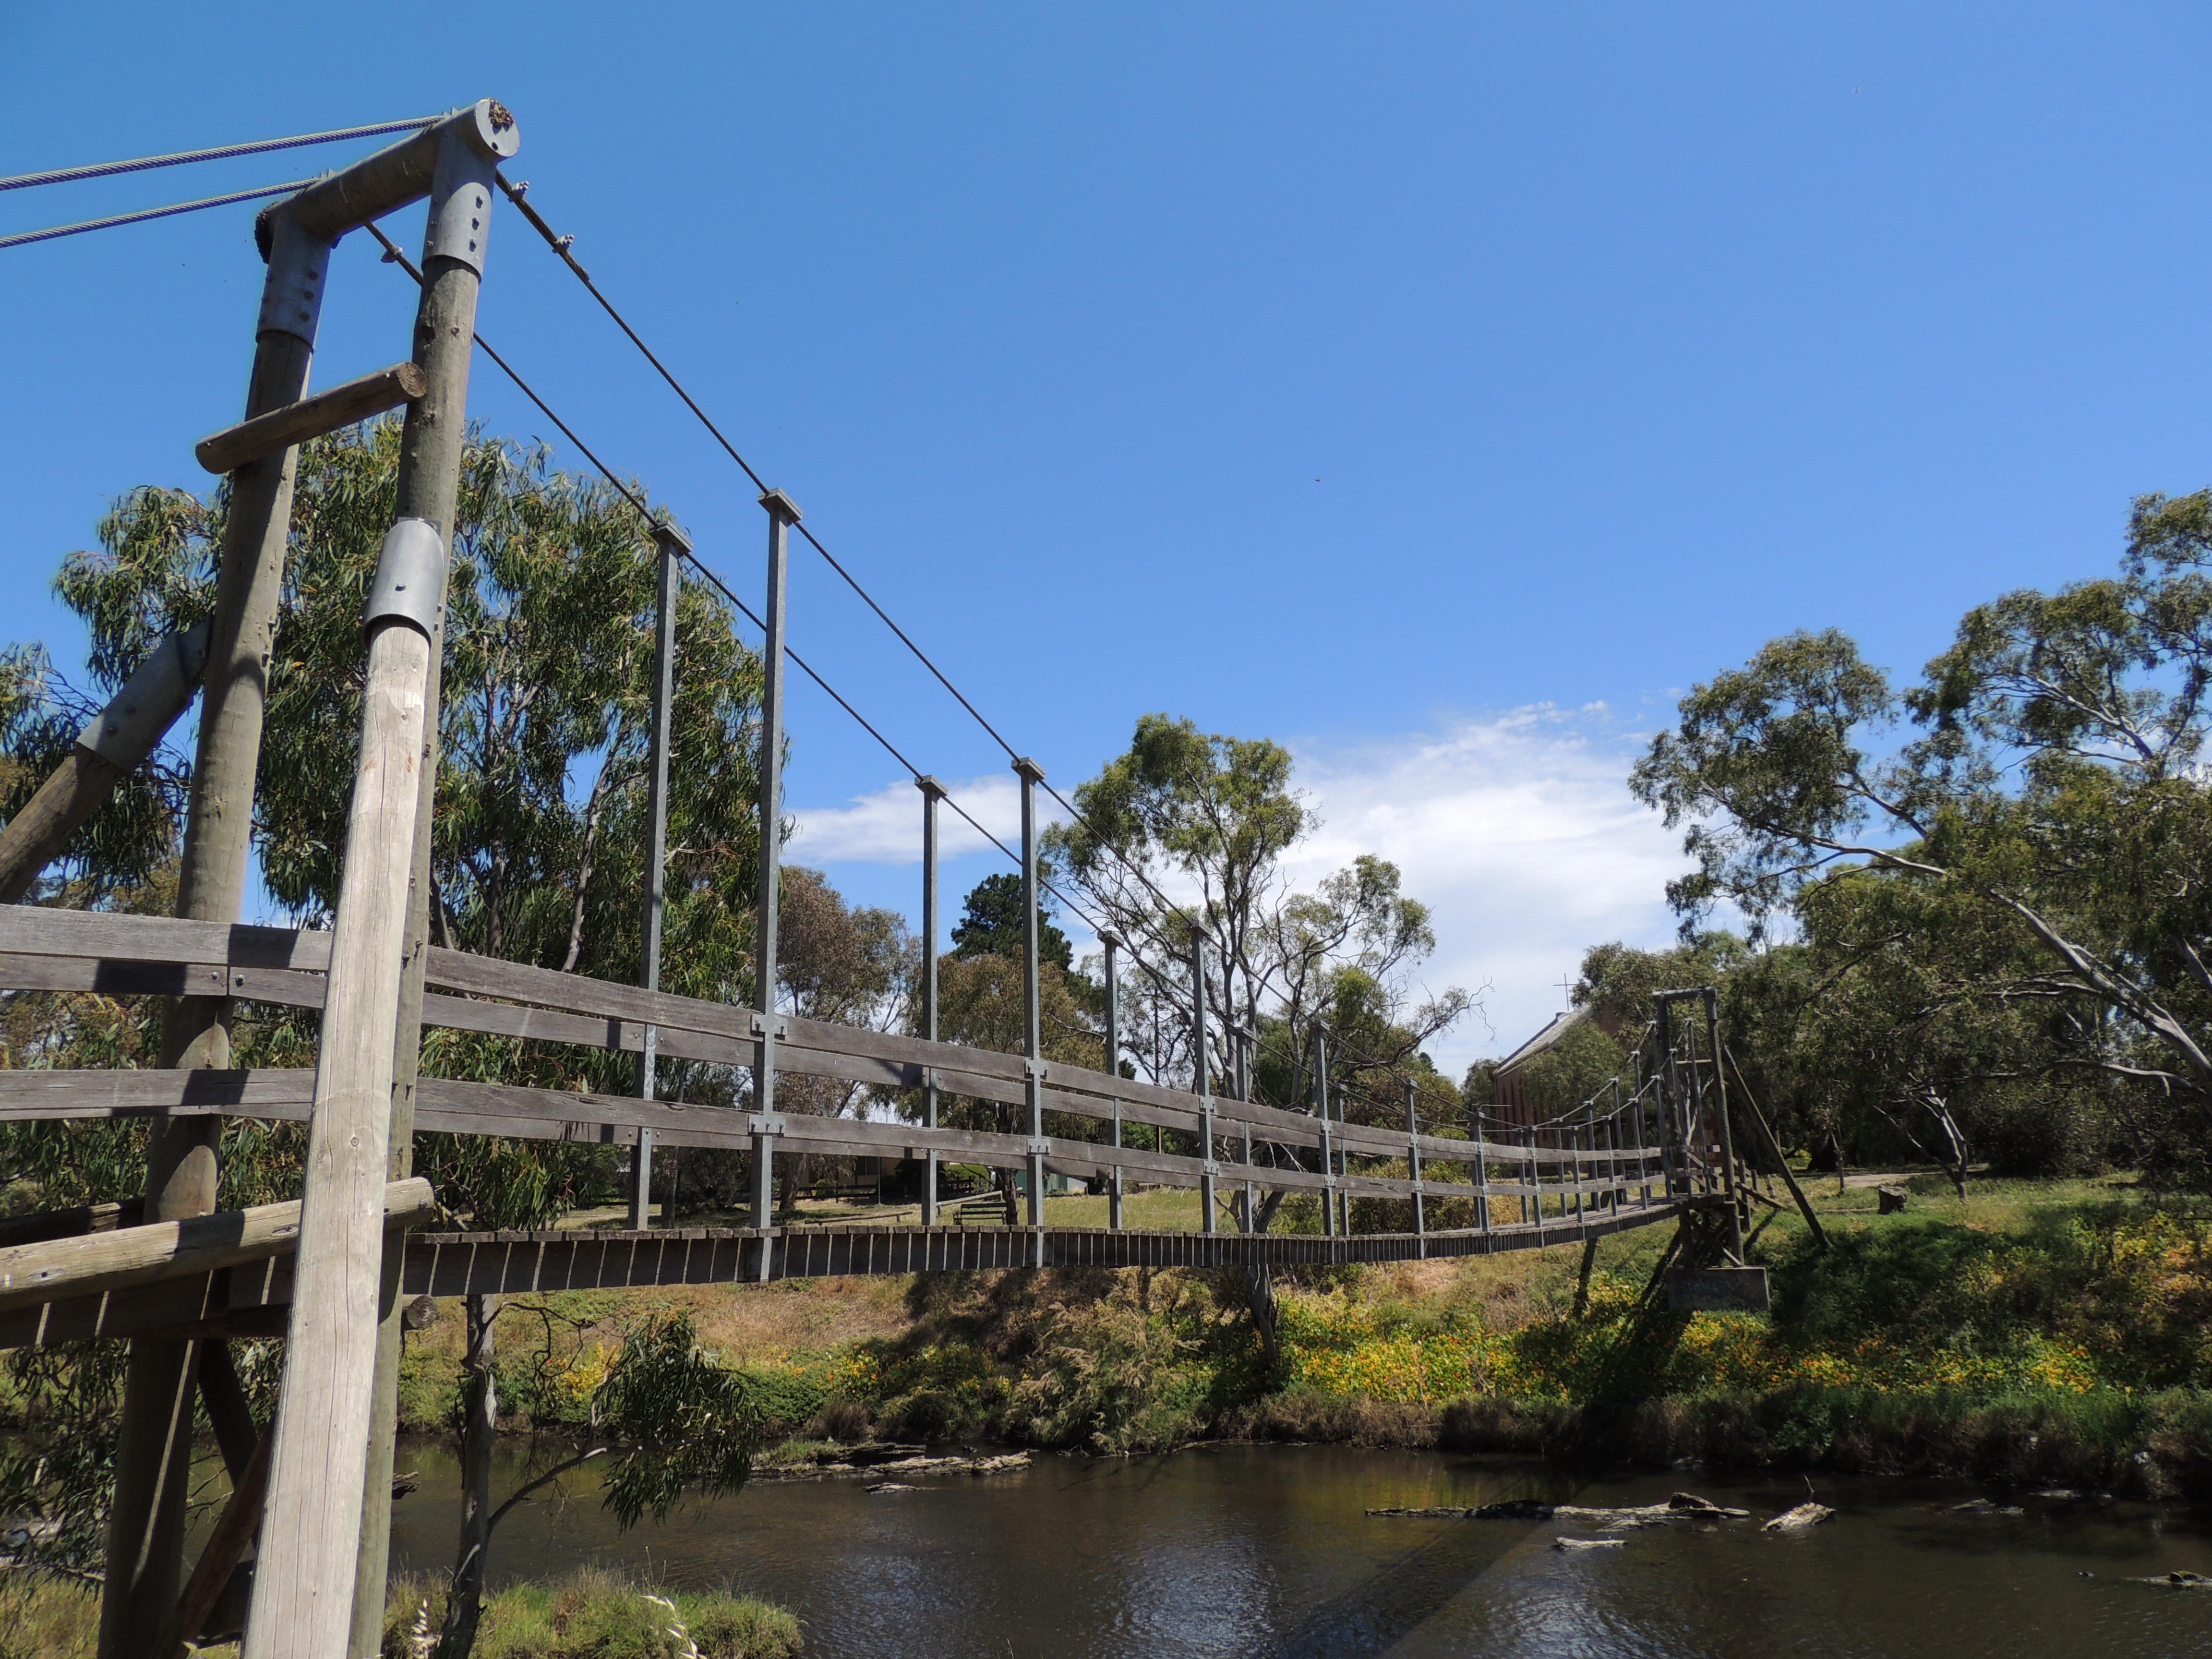 The Onkaparinga Swing Bridge - Adelaide